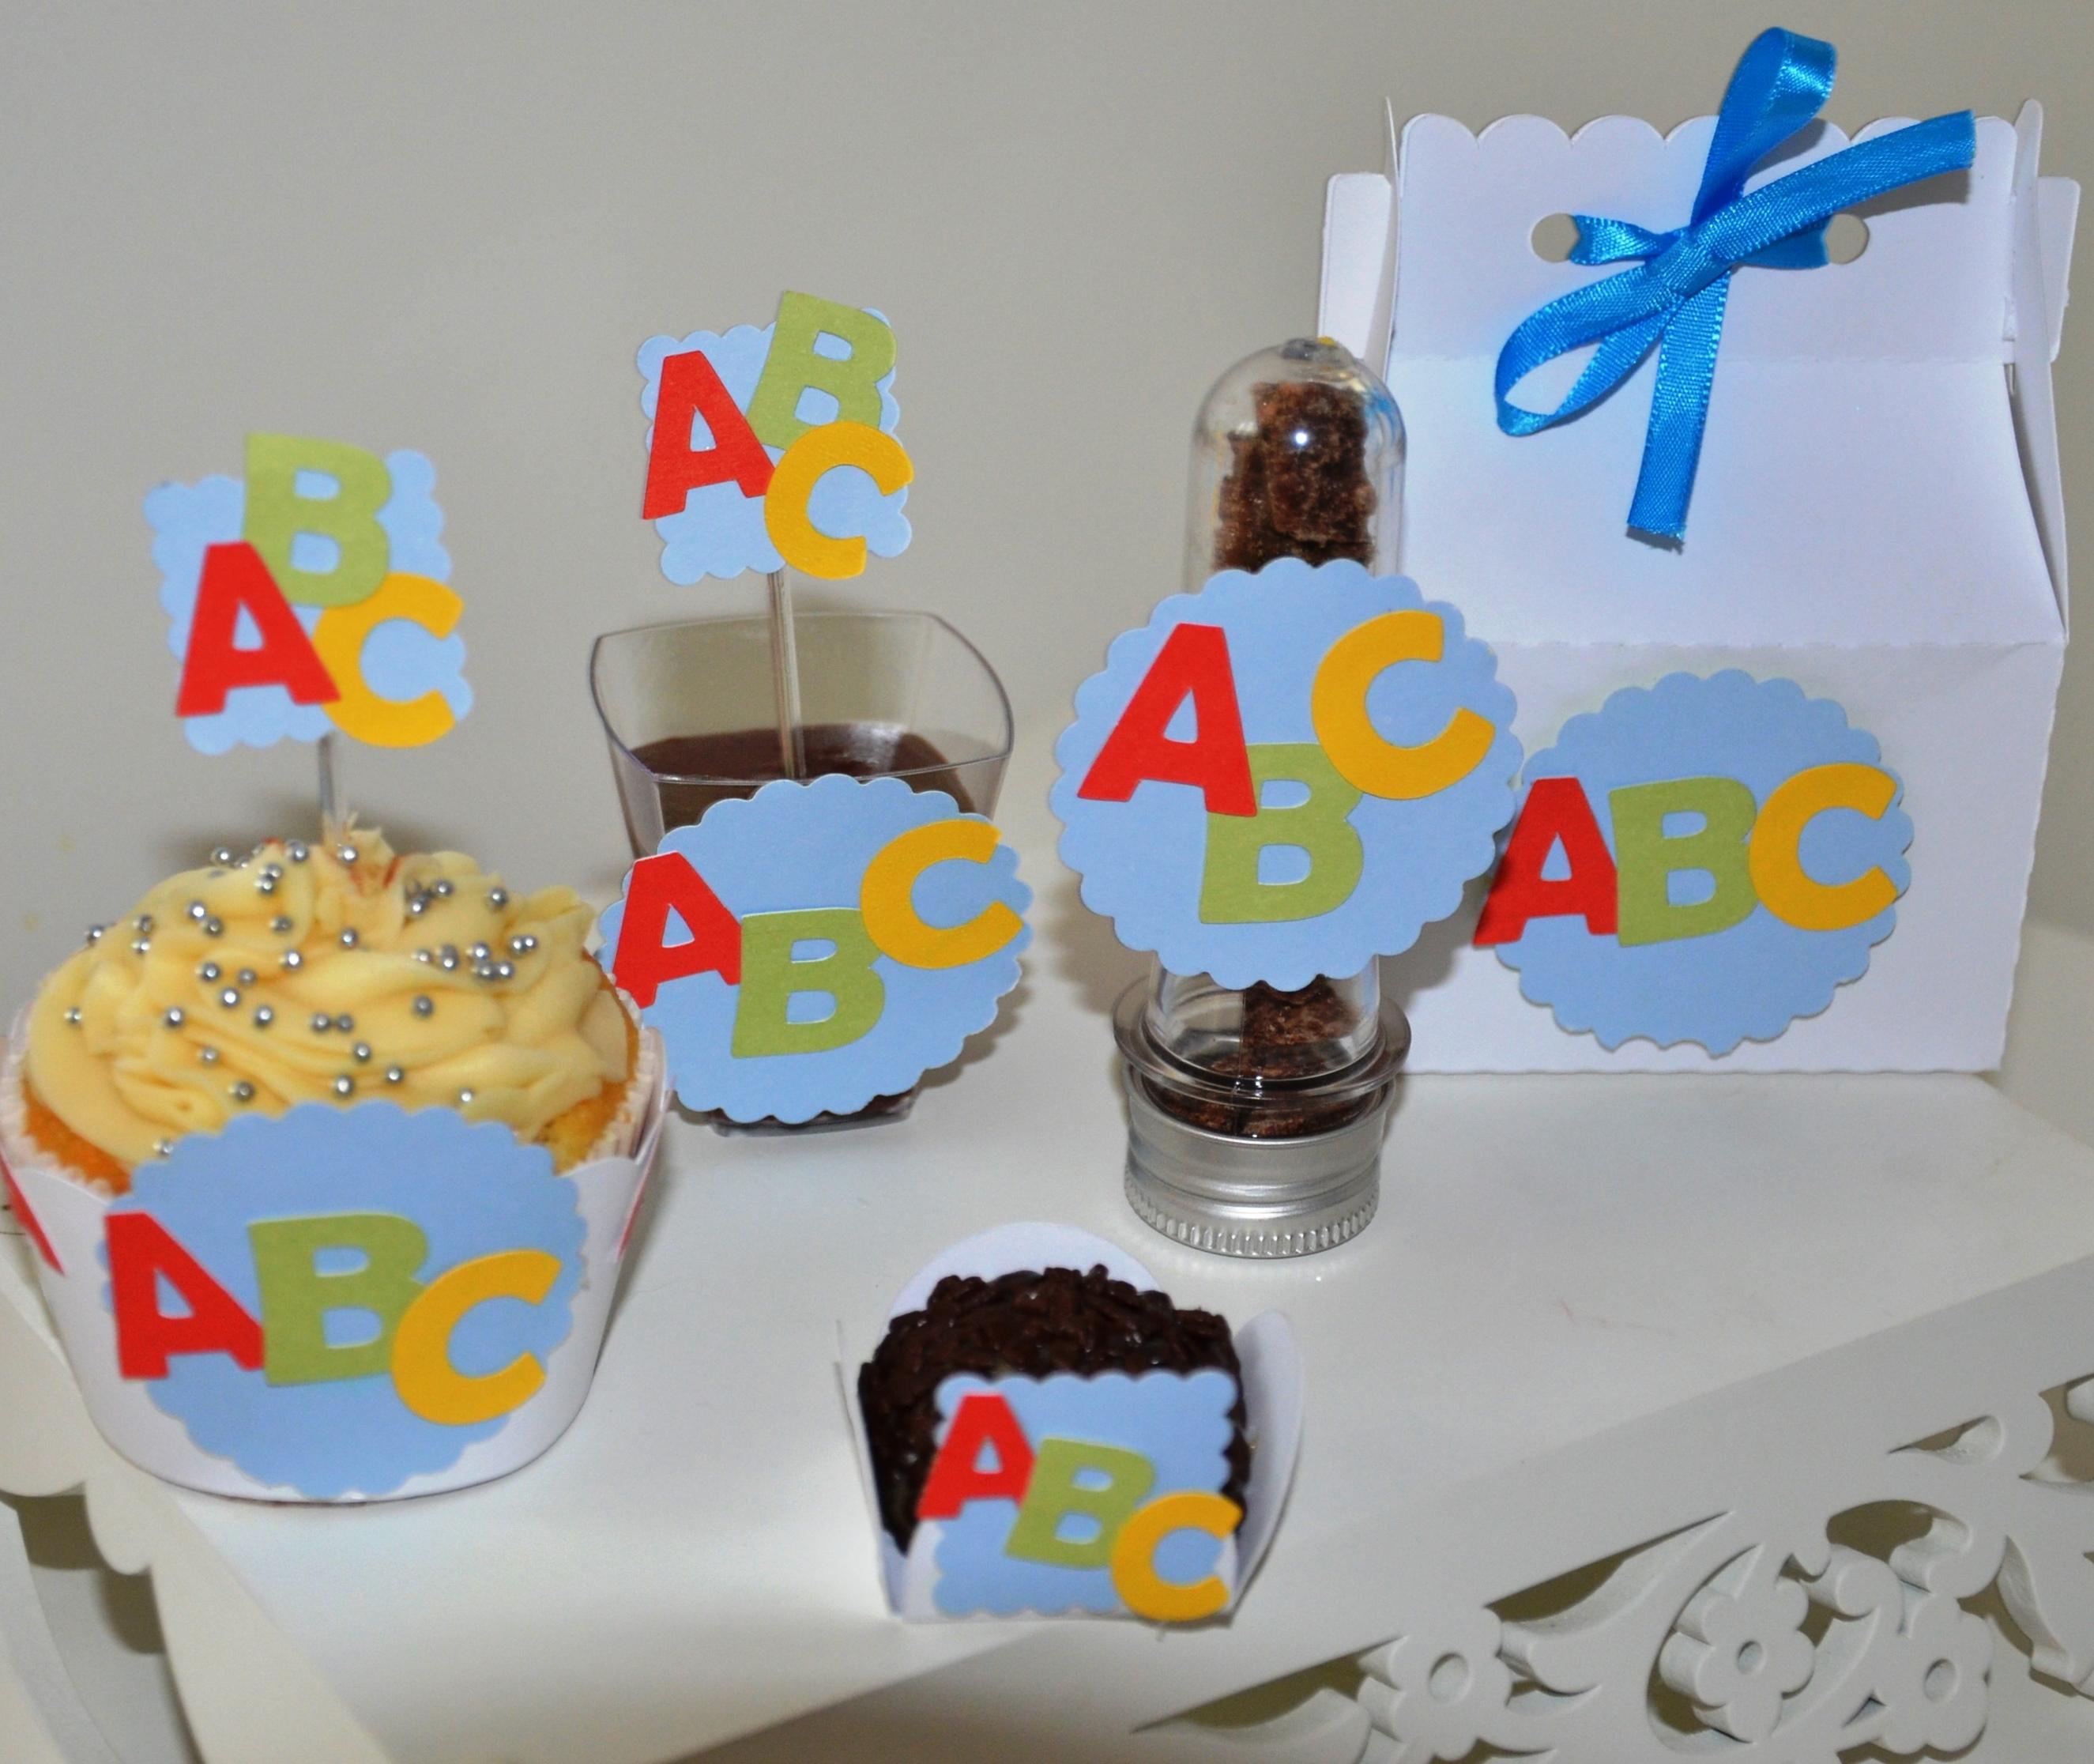 Artigos para festa abc